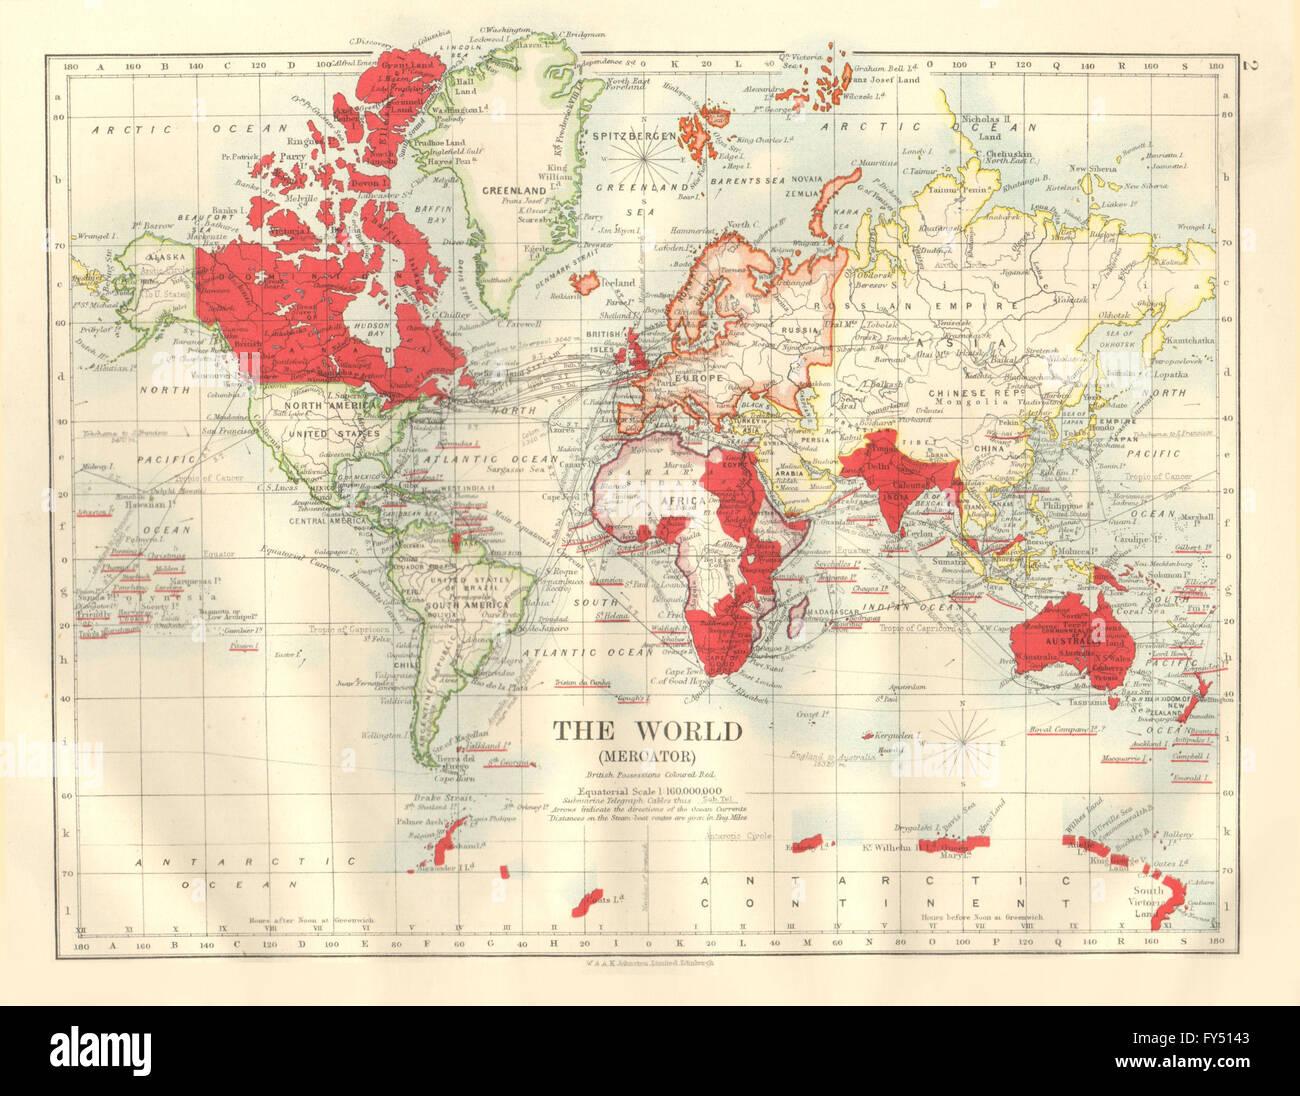 10th Century World Map Stockfotos & 10th Century World Map ...